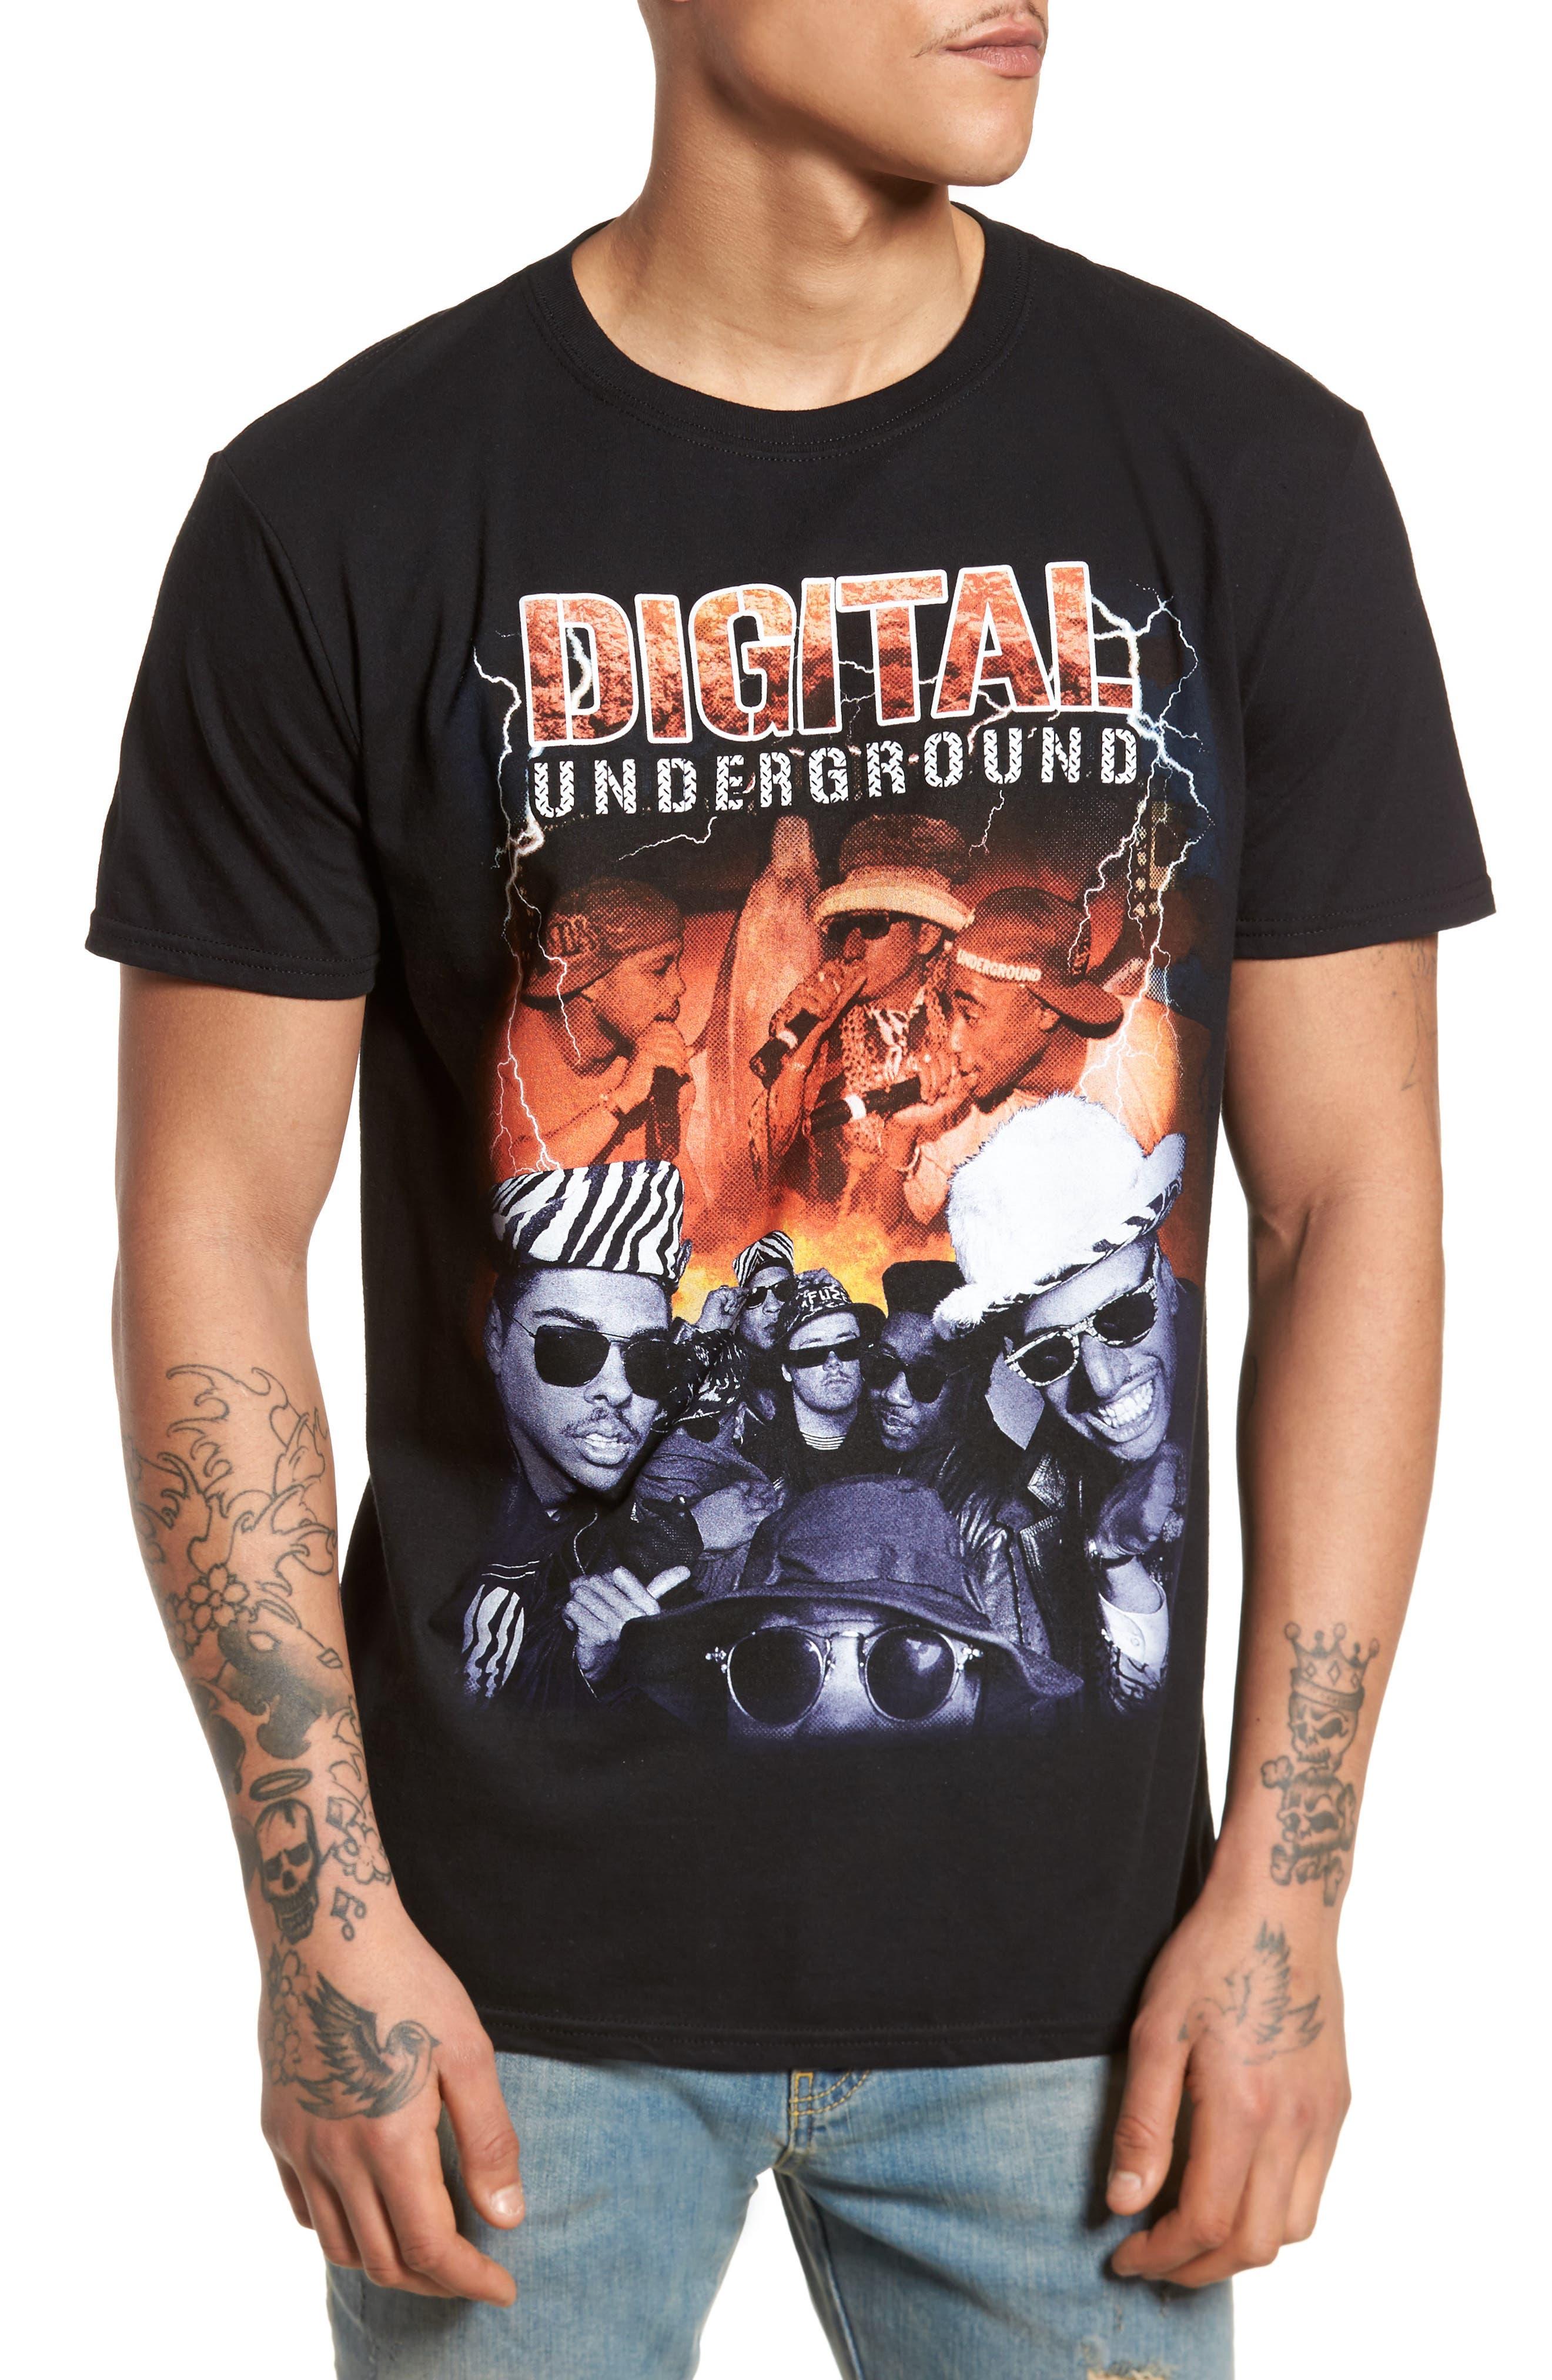 Digital Underground Graphic T-Shirt,                             Main thumbnail 1, color,                             001